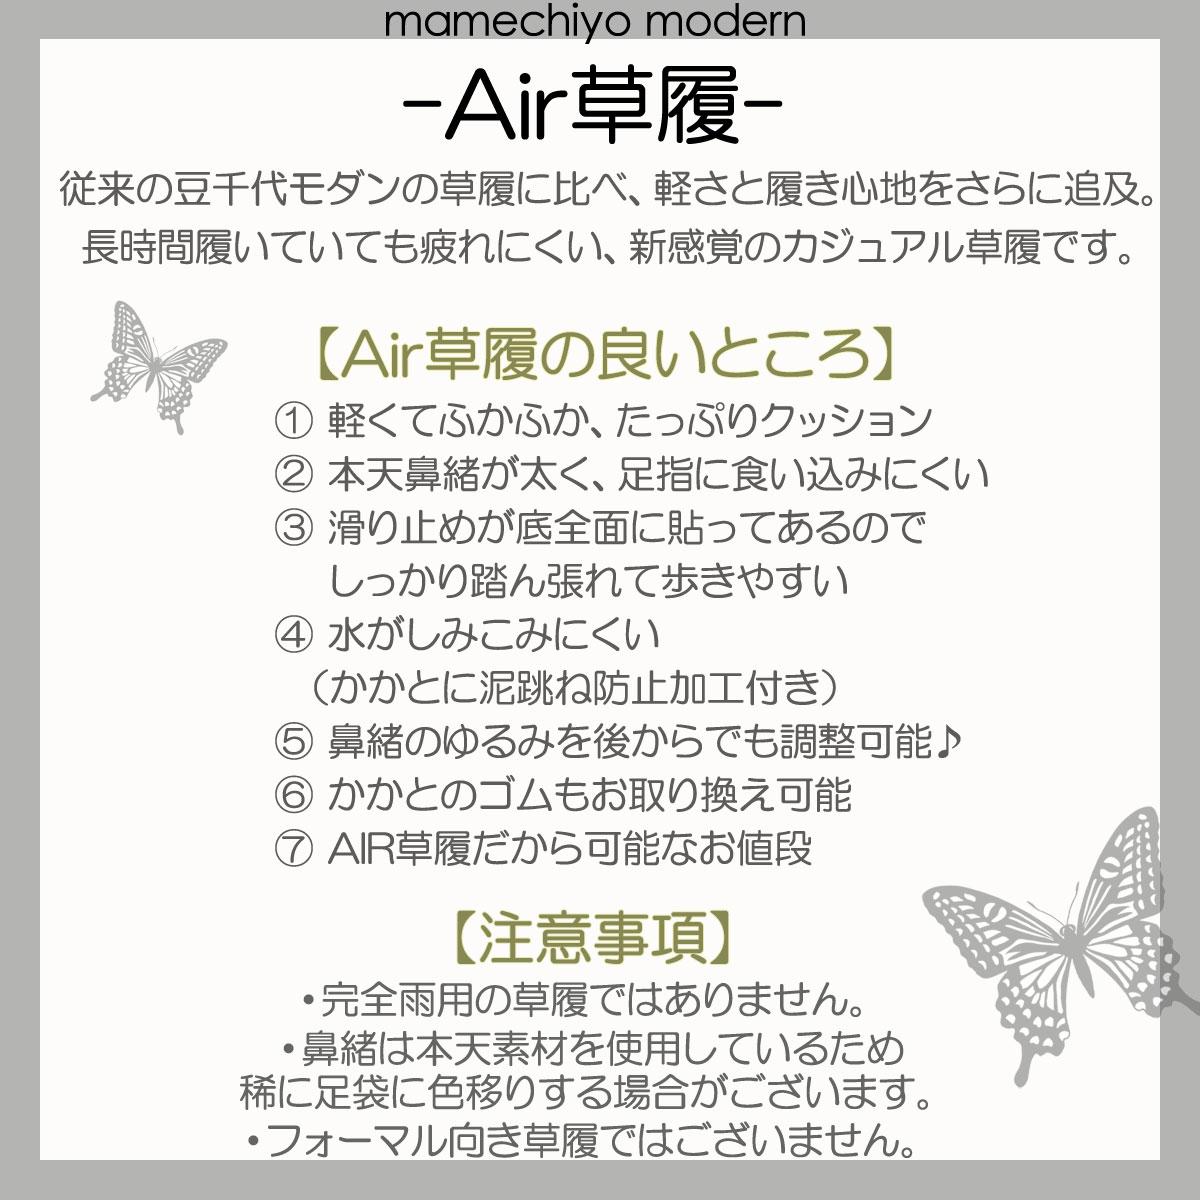 AIR草履 レディ*バタフライ白 福林タイプ若草鼻緒 (S・M・Lサイズ)